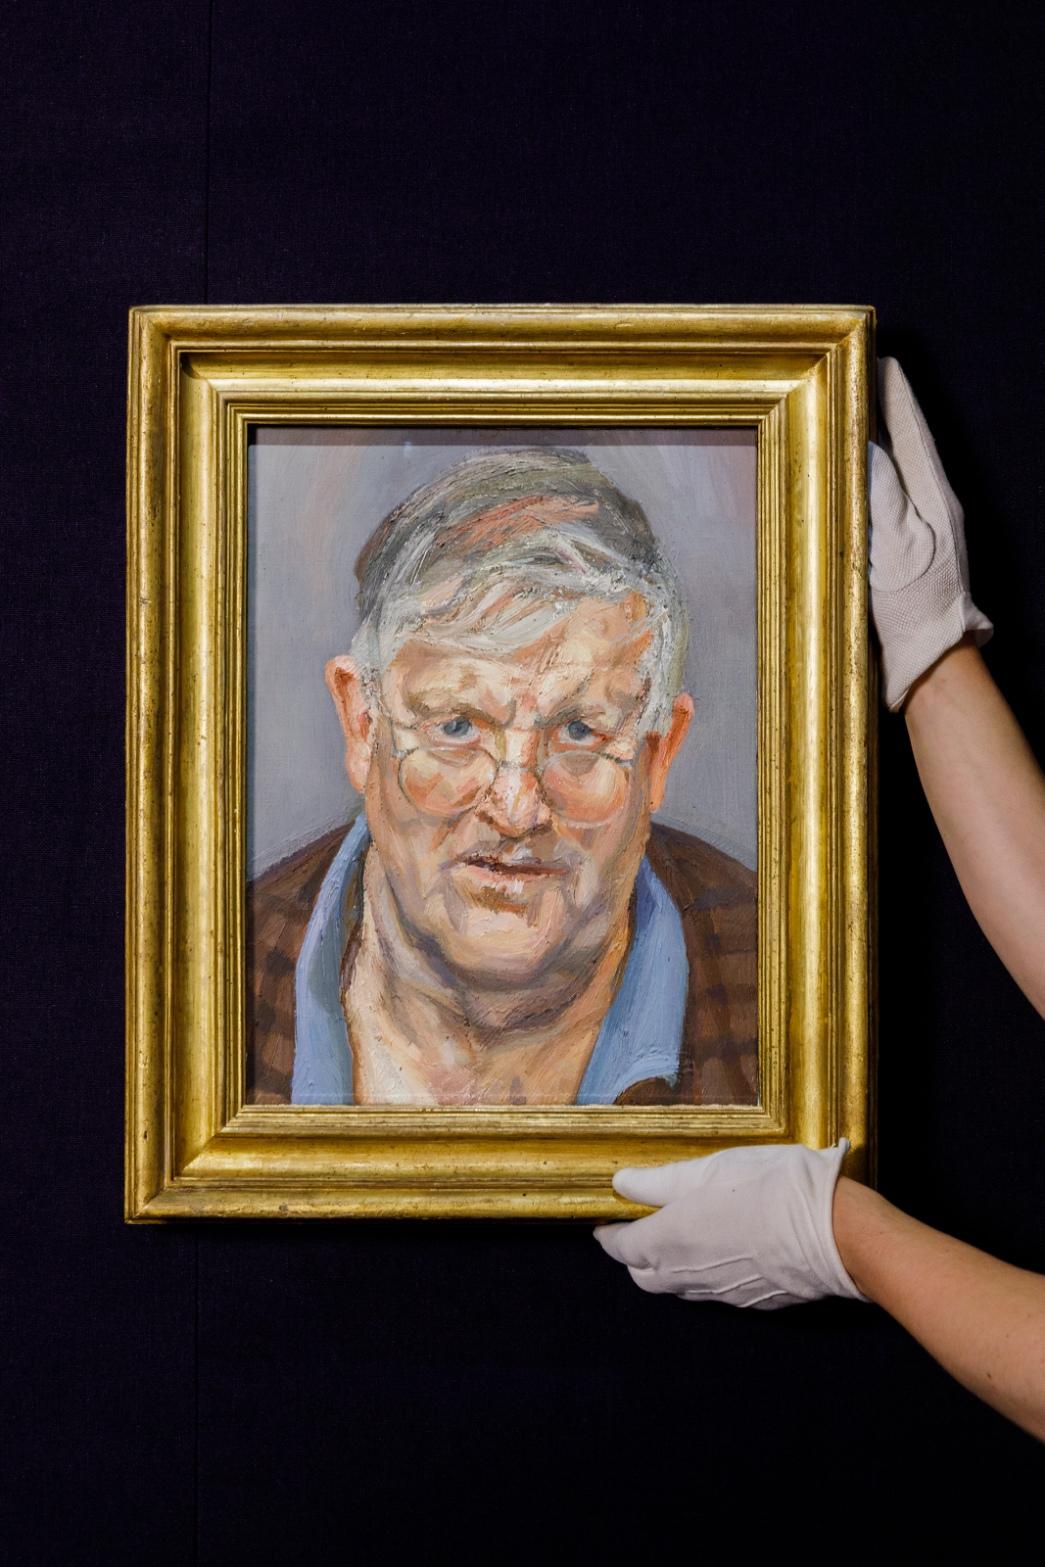 Lot 10- David Hockney, Lucian Freud, in situ 2.jpg